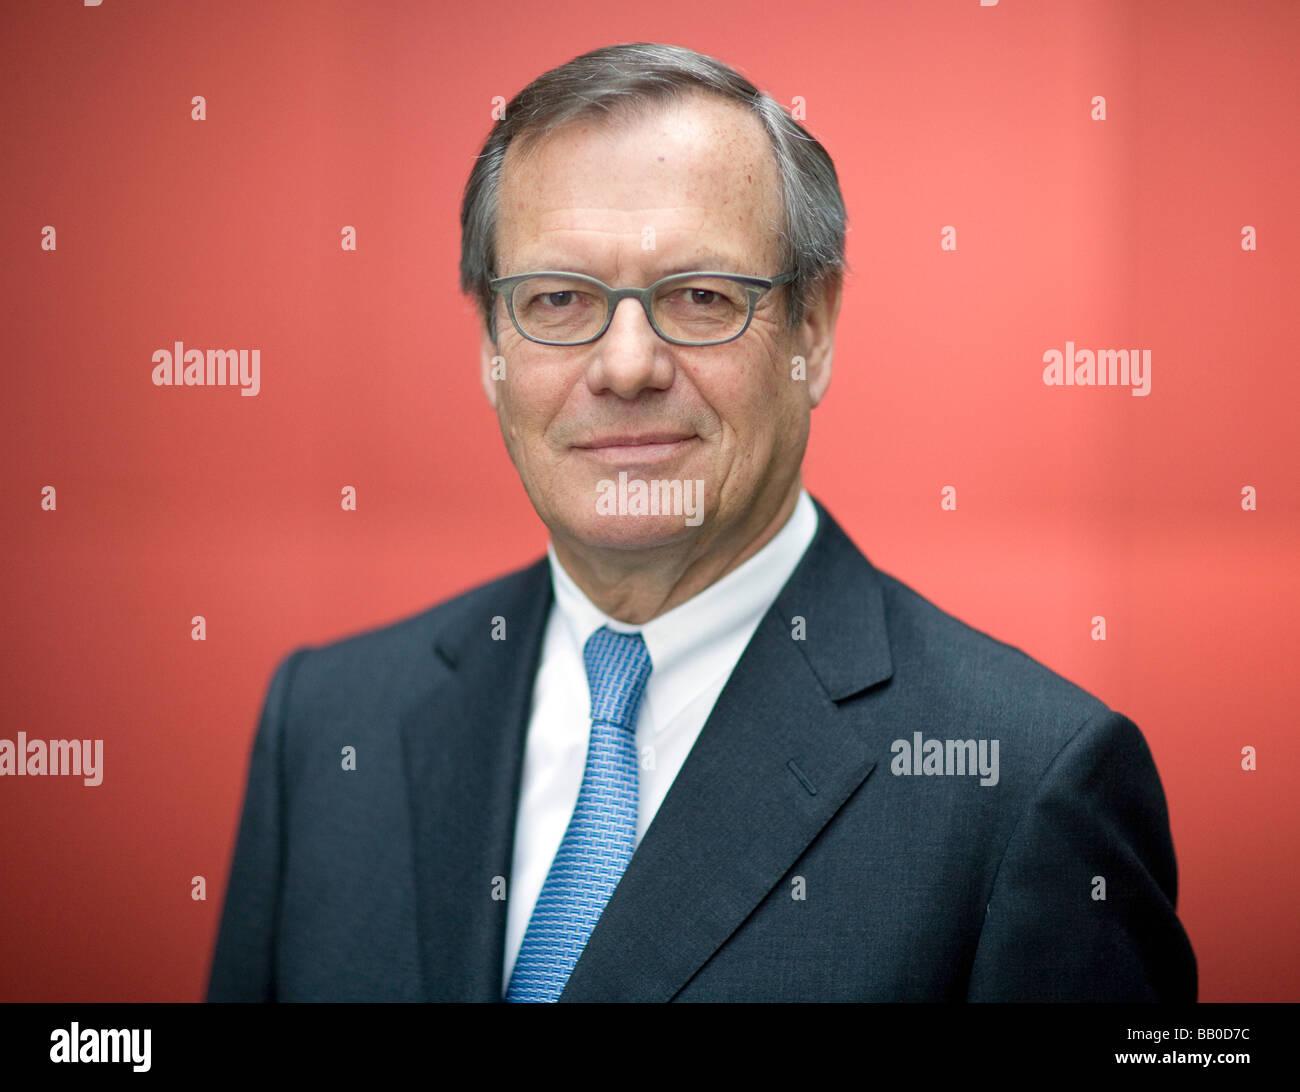 Klaus EBERHARDT CEO of Rheinmetall AG Stock Photo